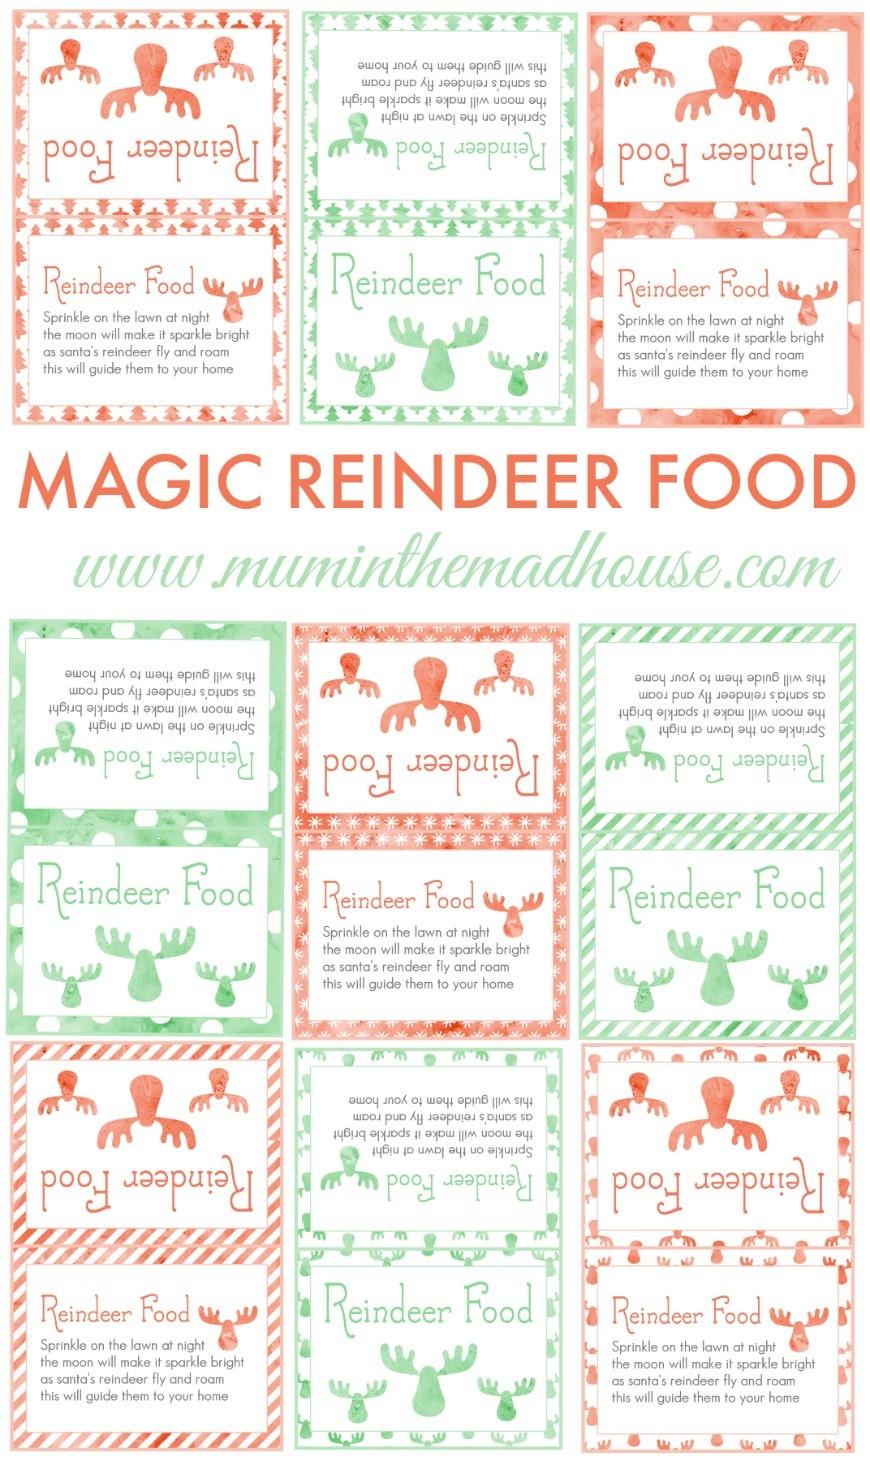 DIY Magic Reindeer Food - Mum In The Madhouse